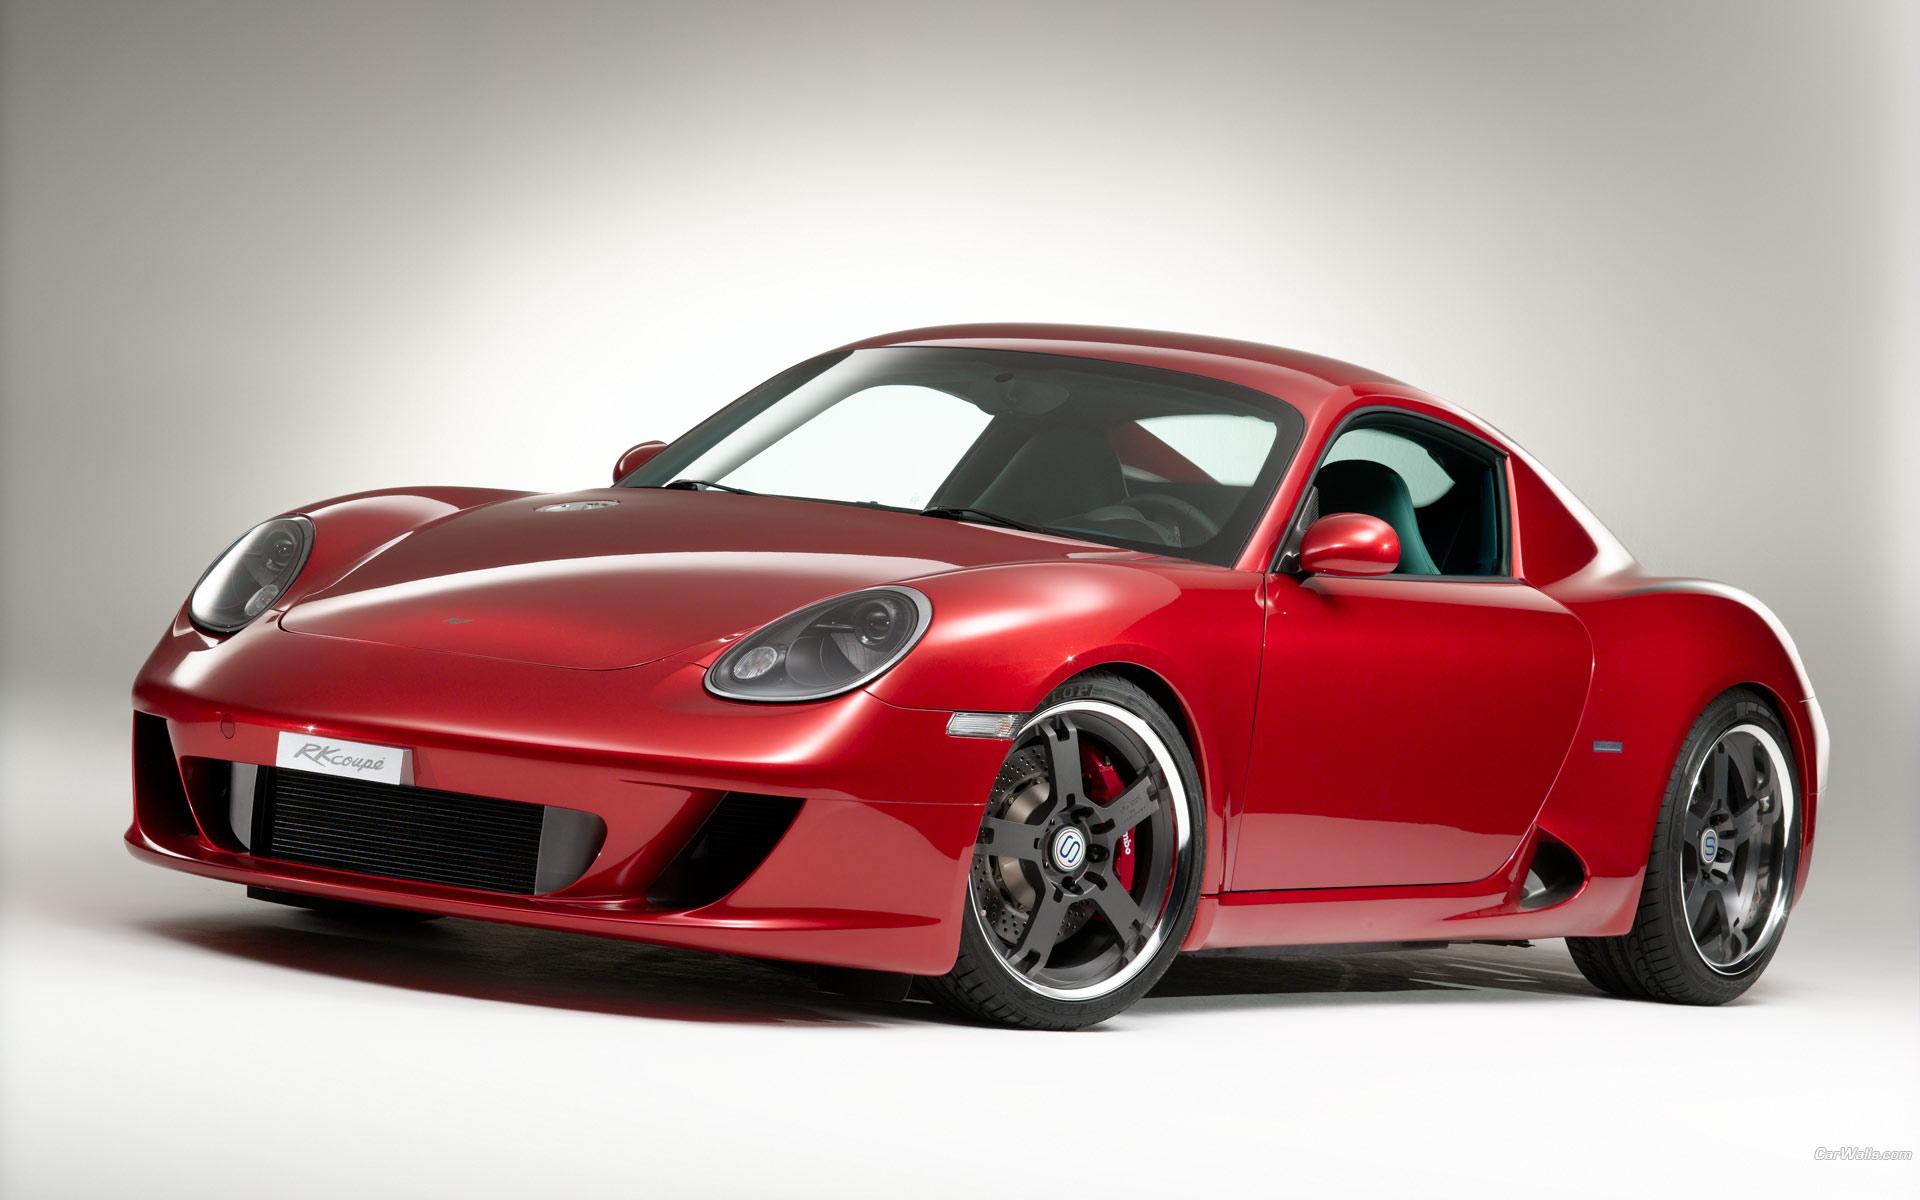 Porsche Cayman rojo - 1920x1200